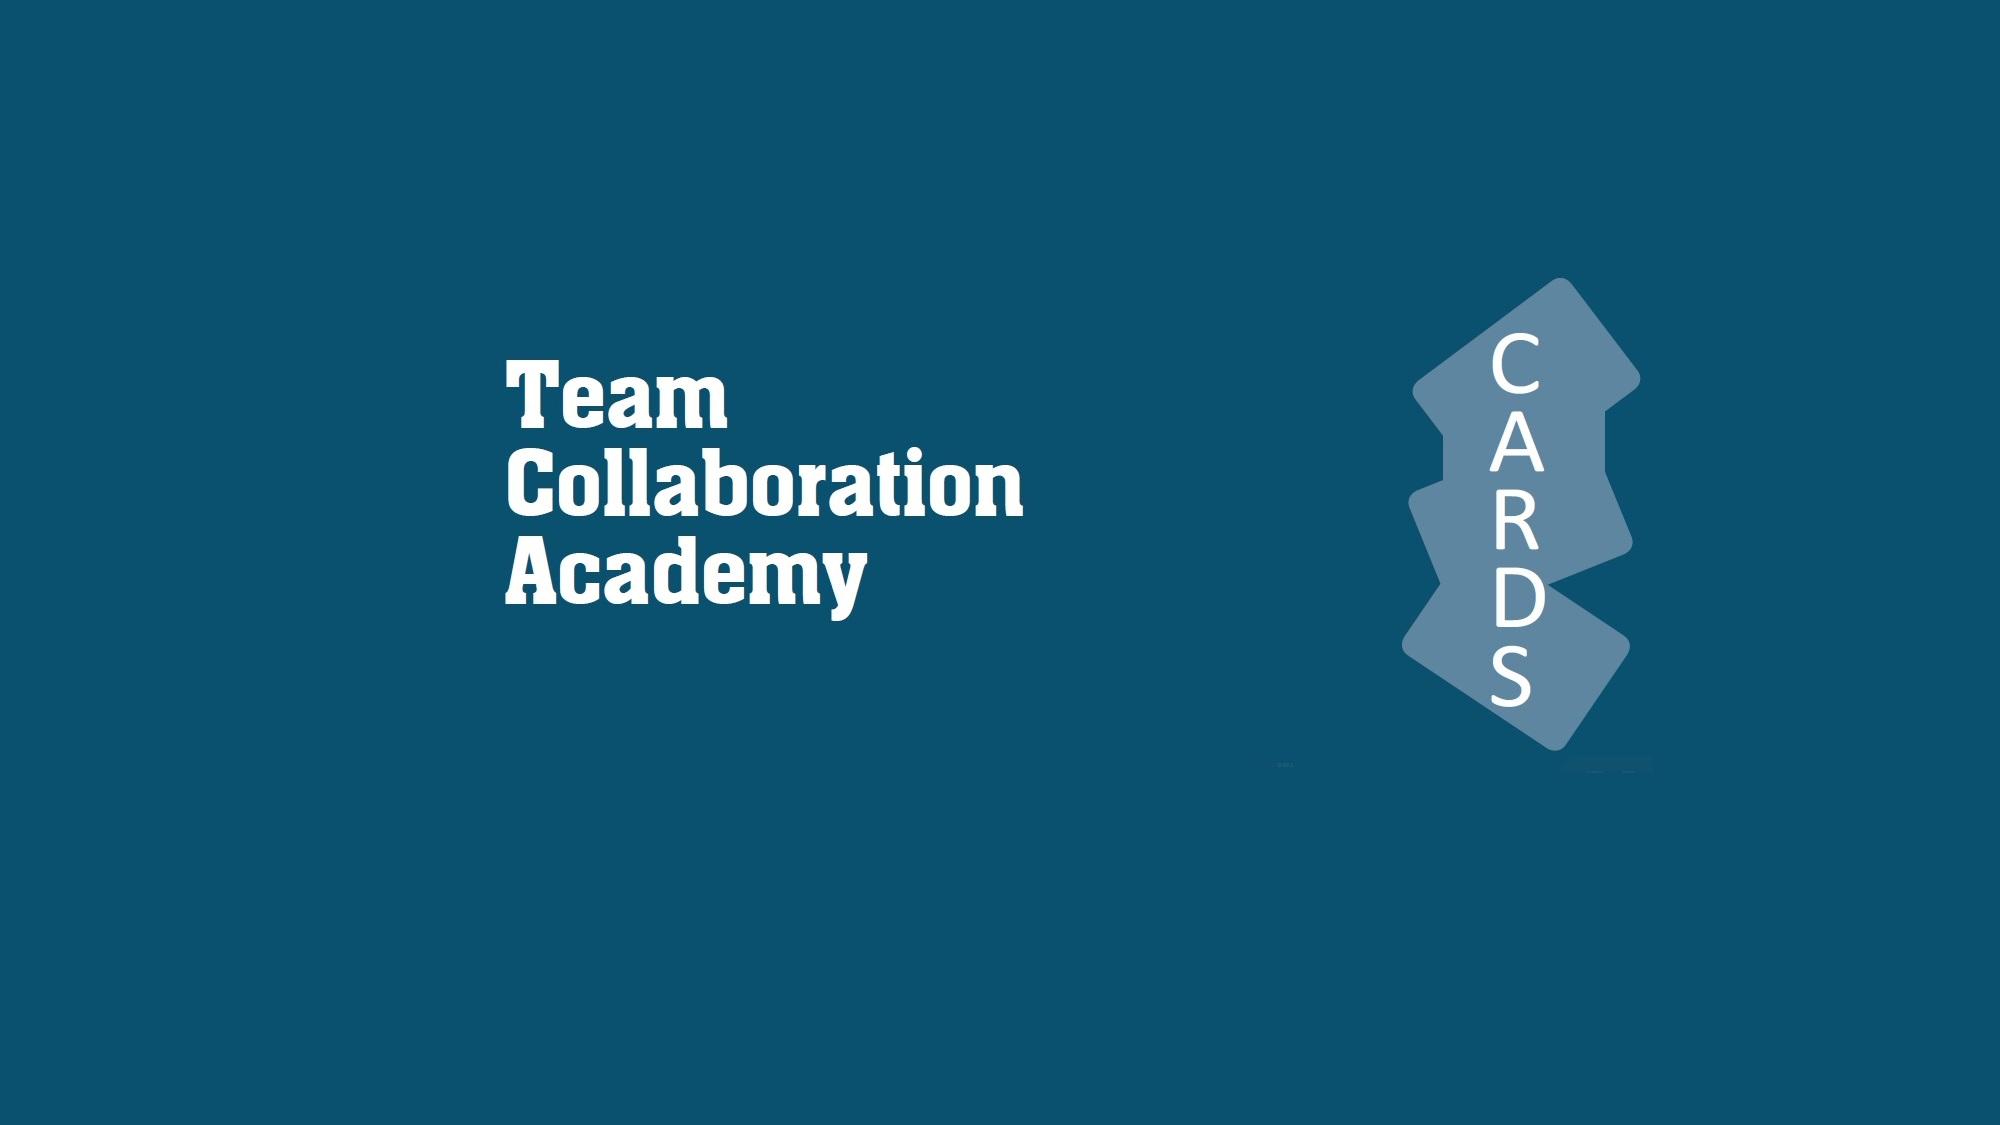 Team Collaboration Academy logo